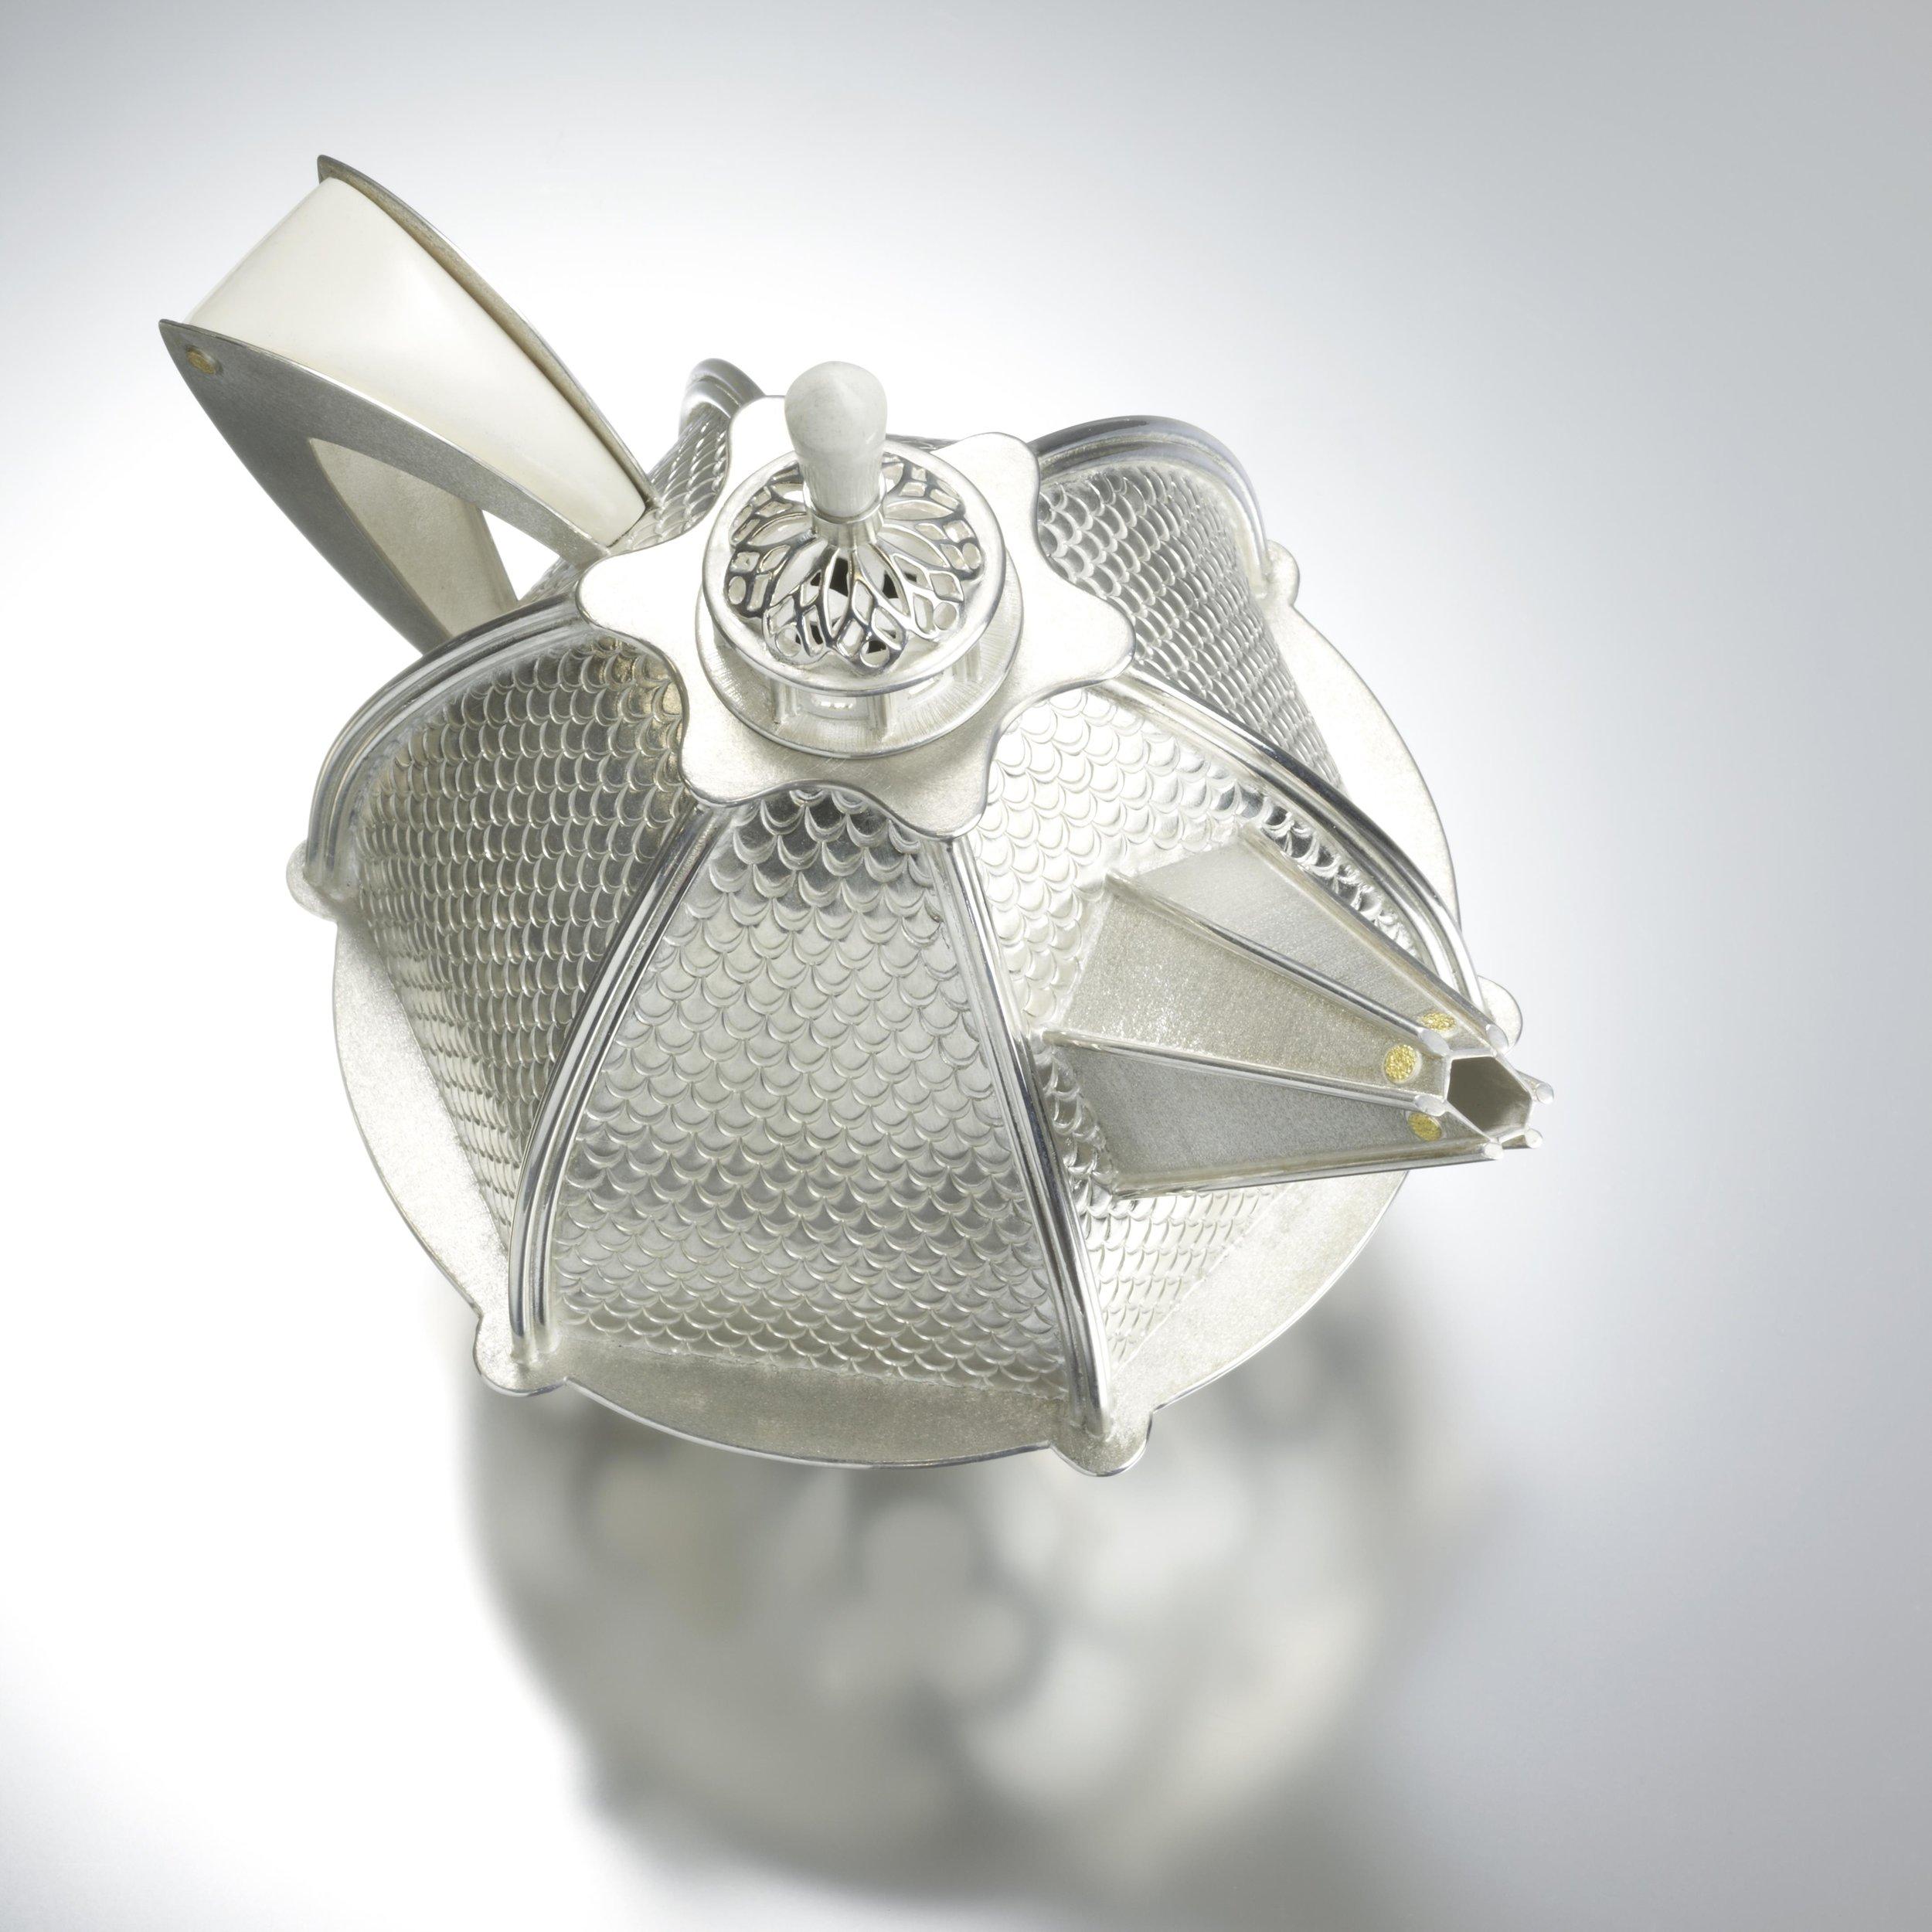 2012_SBDA_1st place_Hollowware_Tom Ferrero-4_lg.jpg